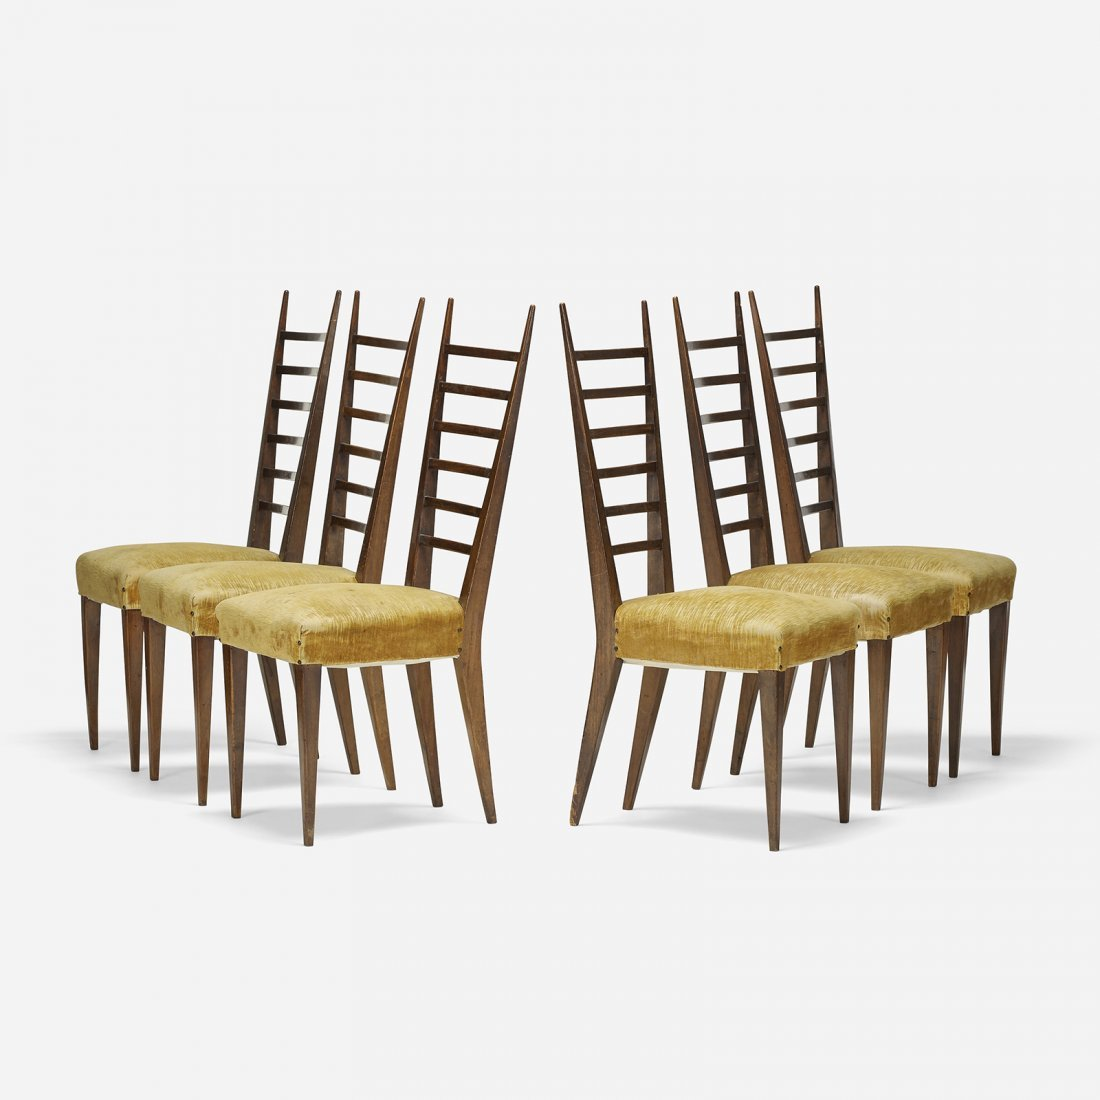 Italian dining chairs, set of six